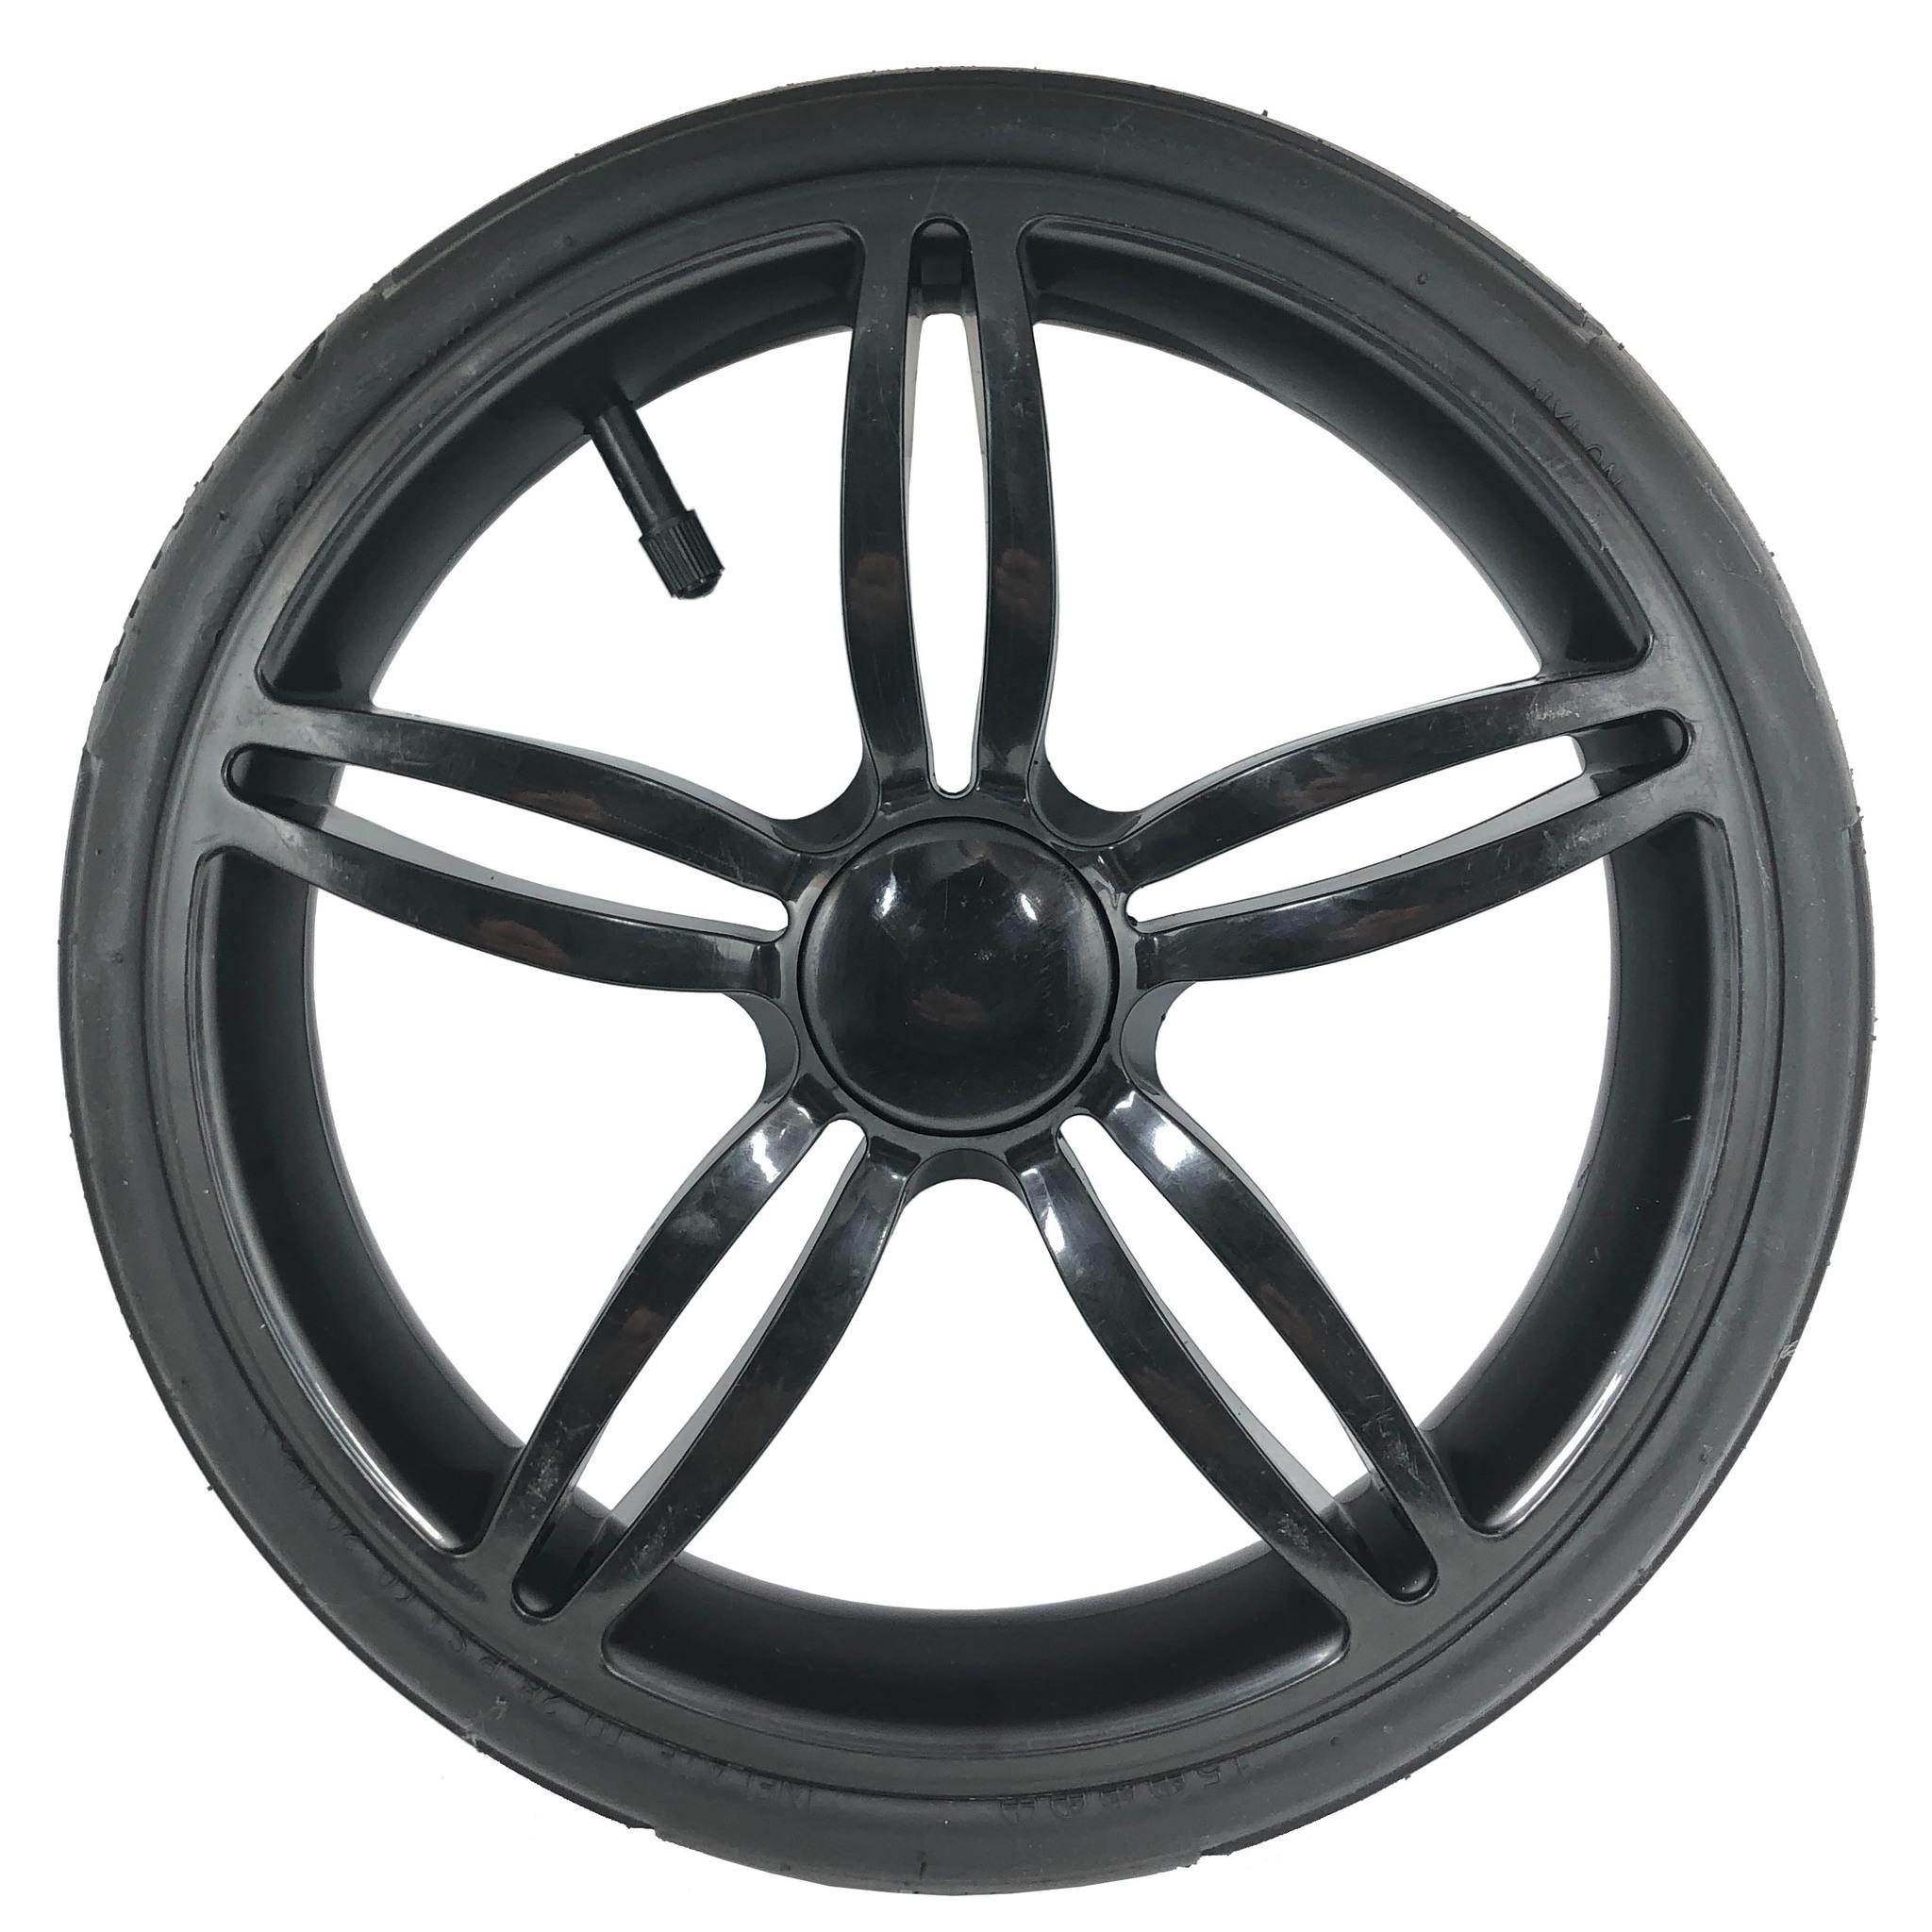 12 дюймов (30 см) Колесо 60x230 Speed | Drifting 60-230_надувное.jpg